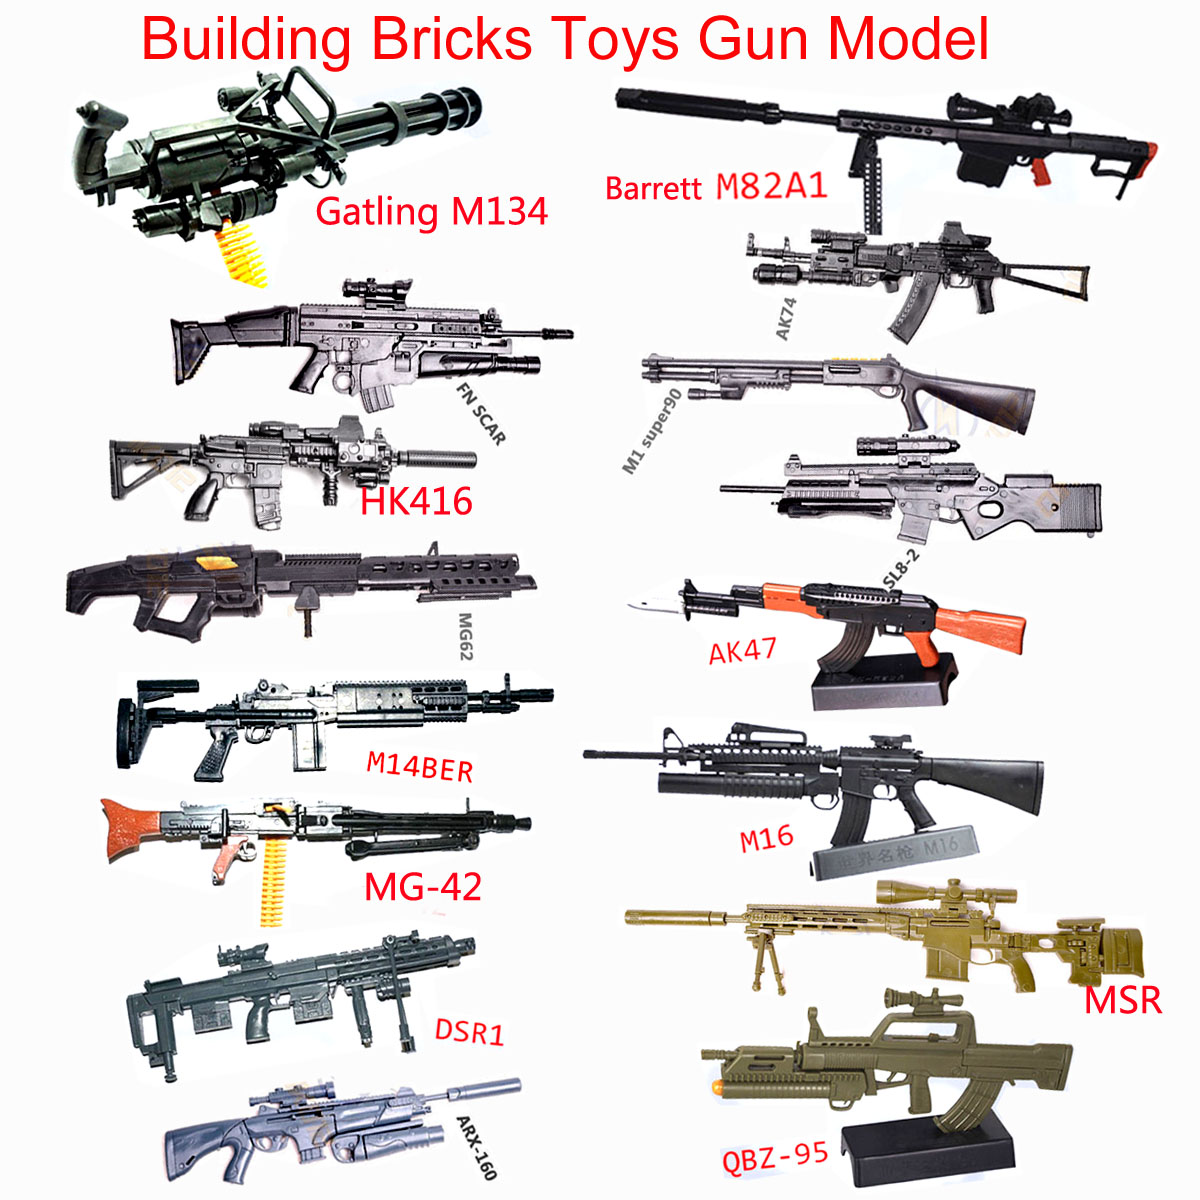 1:6 Scale Toy Gun Model M134 MG42 AK47 98K Rifle Puzzles Building Bricks Assembly Gun Model PUBG Weapon For Action Figure